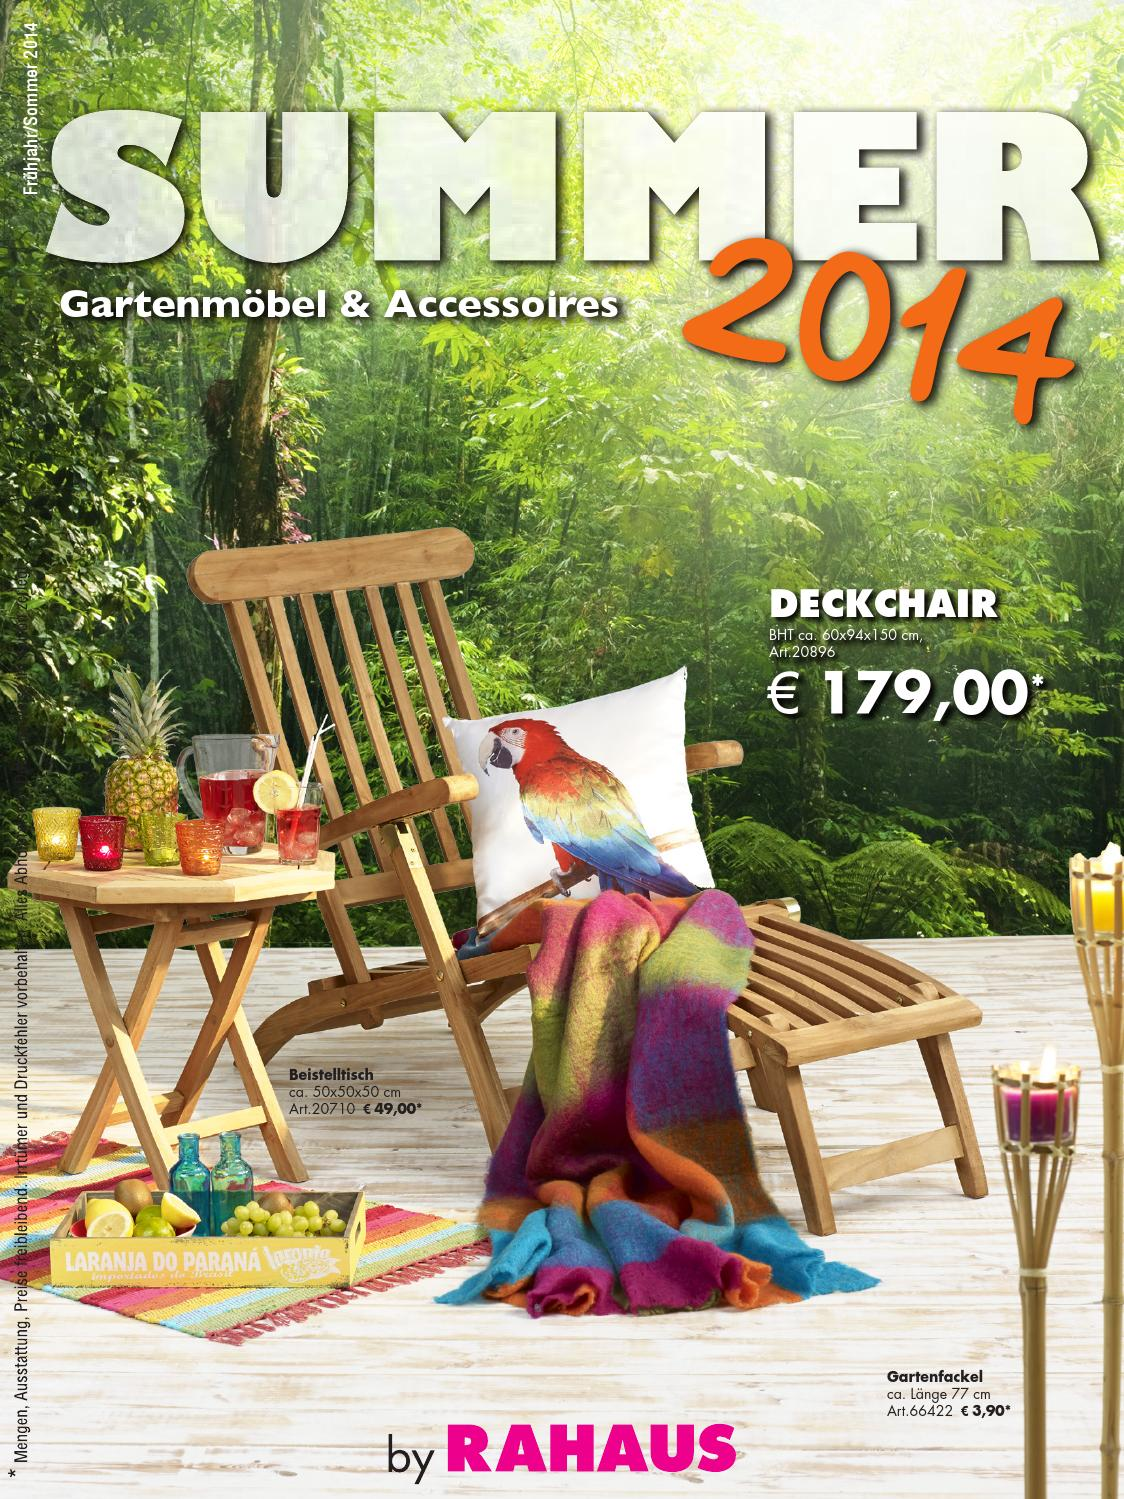 Möbel rahaus summer prospekt 2014 04 10 by catalogofree - issuu